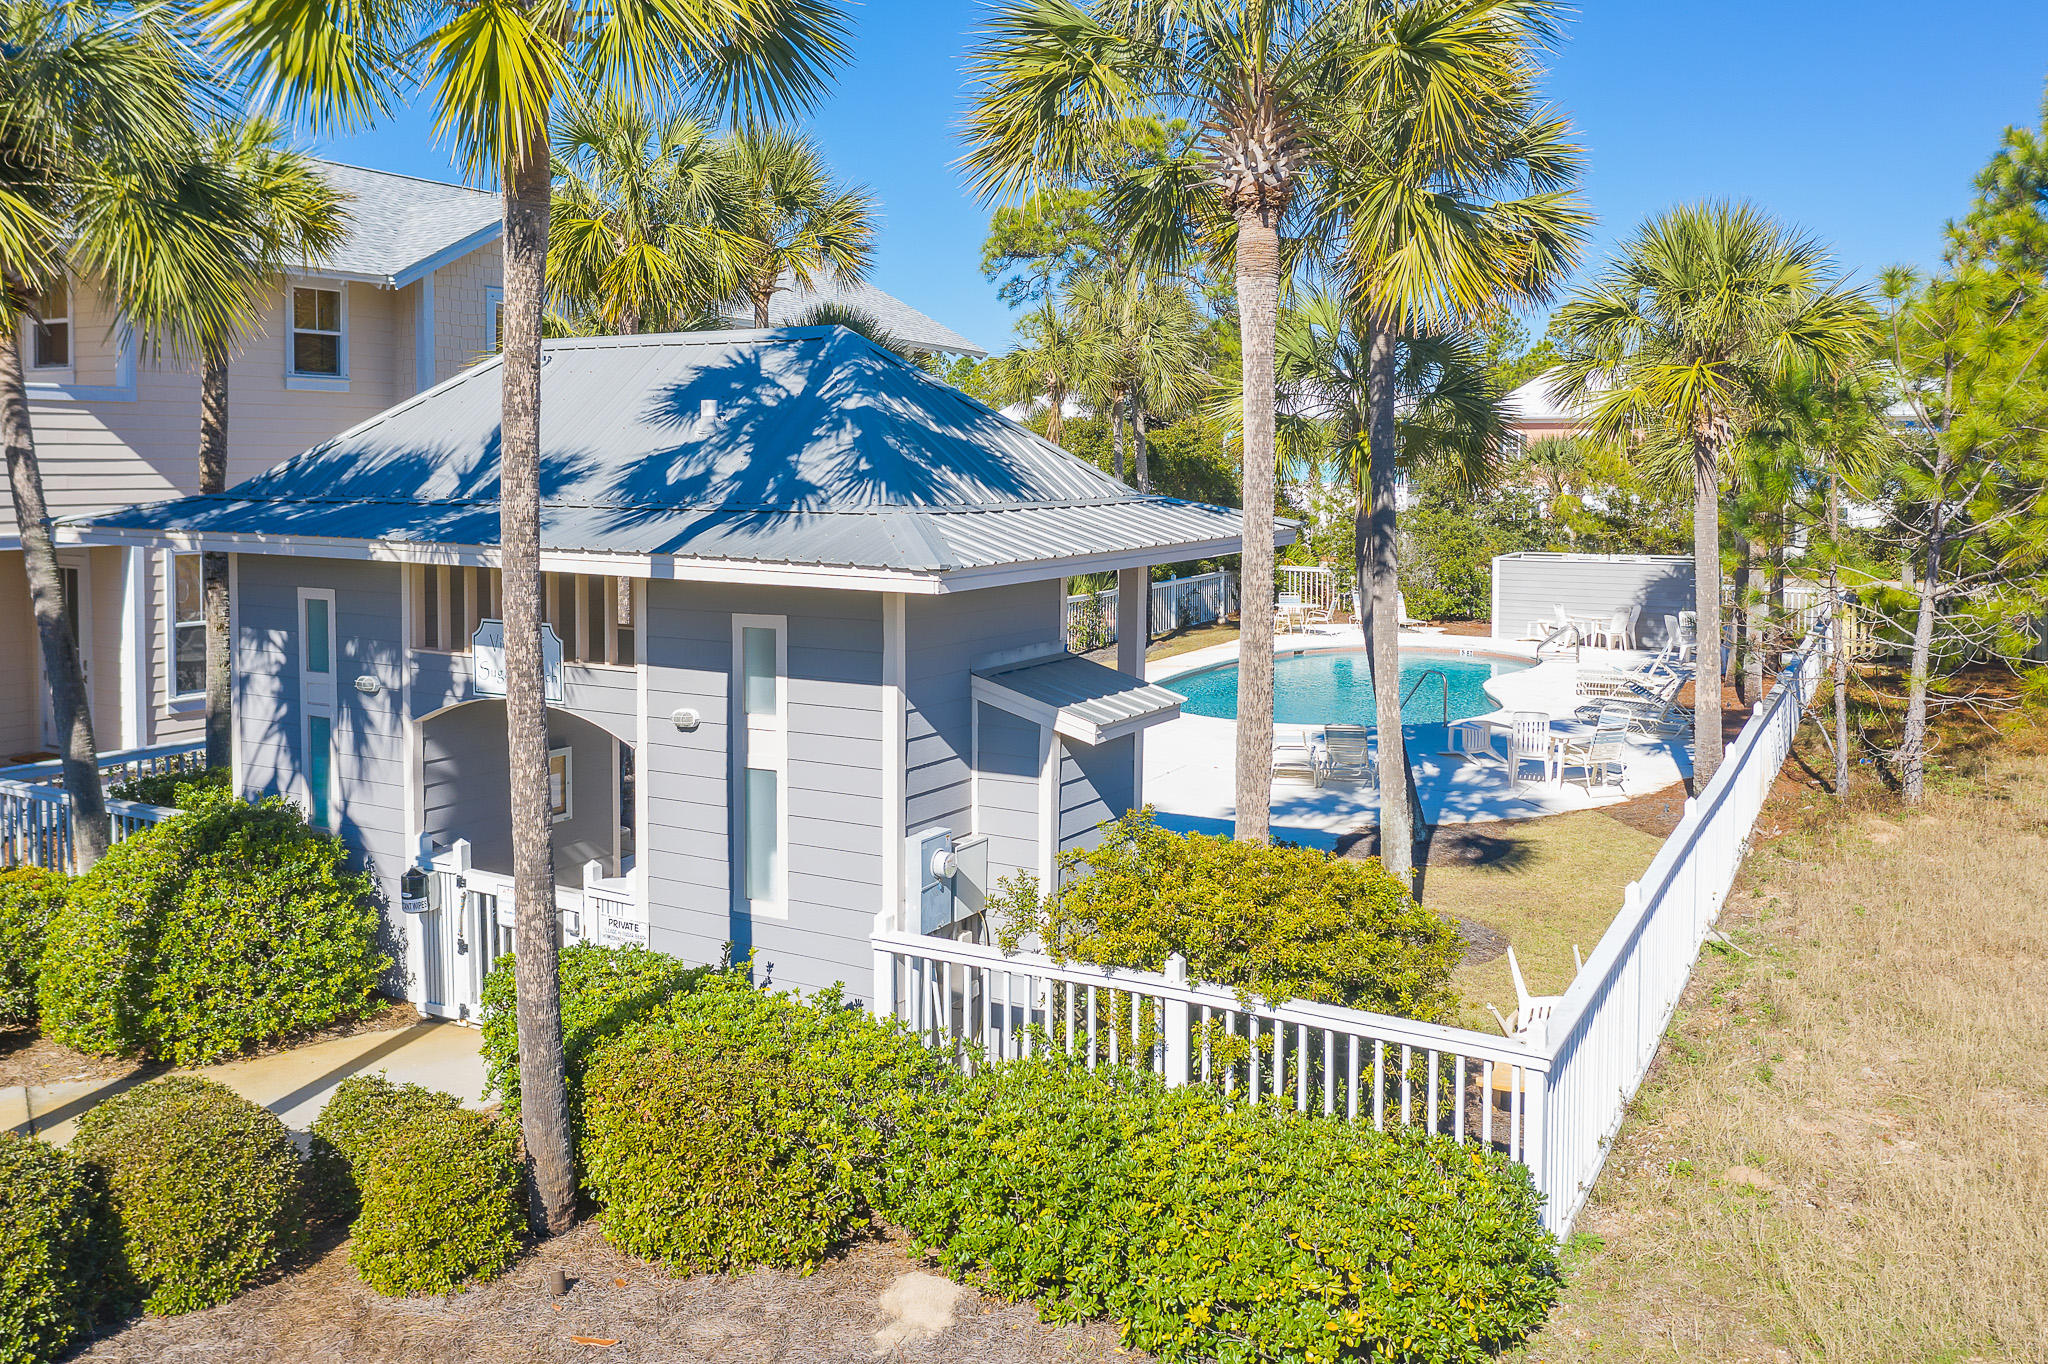 Photo of home for sale at 80 Sand Dollar, Santa Rosa Beach FL